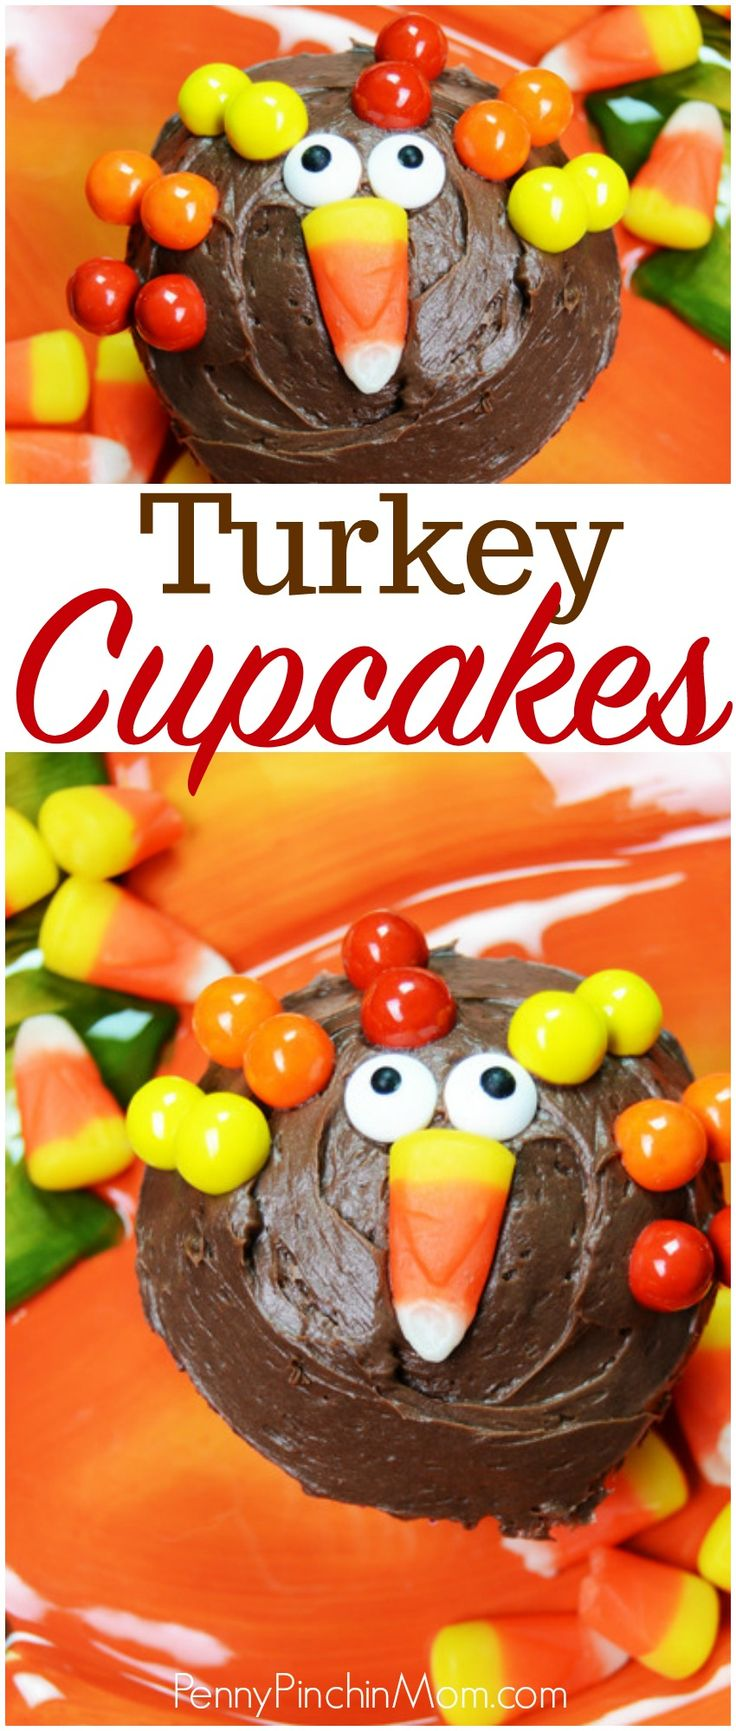 Turkey Cupcakes | Kid's Thanksgiving | Kid Friendly Thanksgiving Recipe | Turkey Cupcake Recipe | Easy Thanksgiving Dessert |  #Thanksgiving #Kids #cupcakes